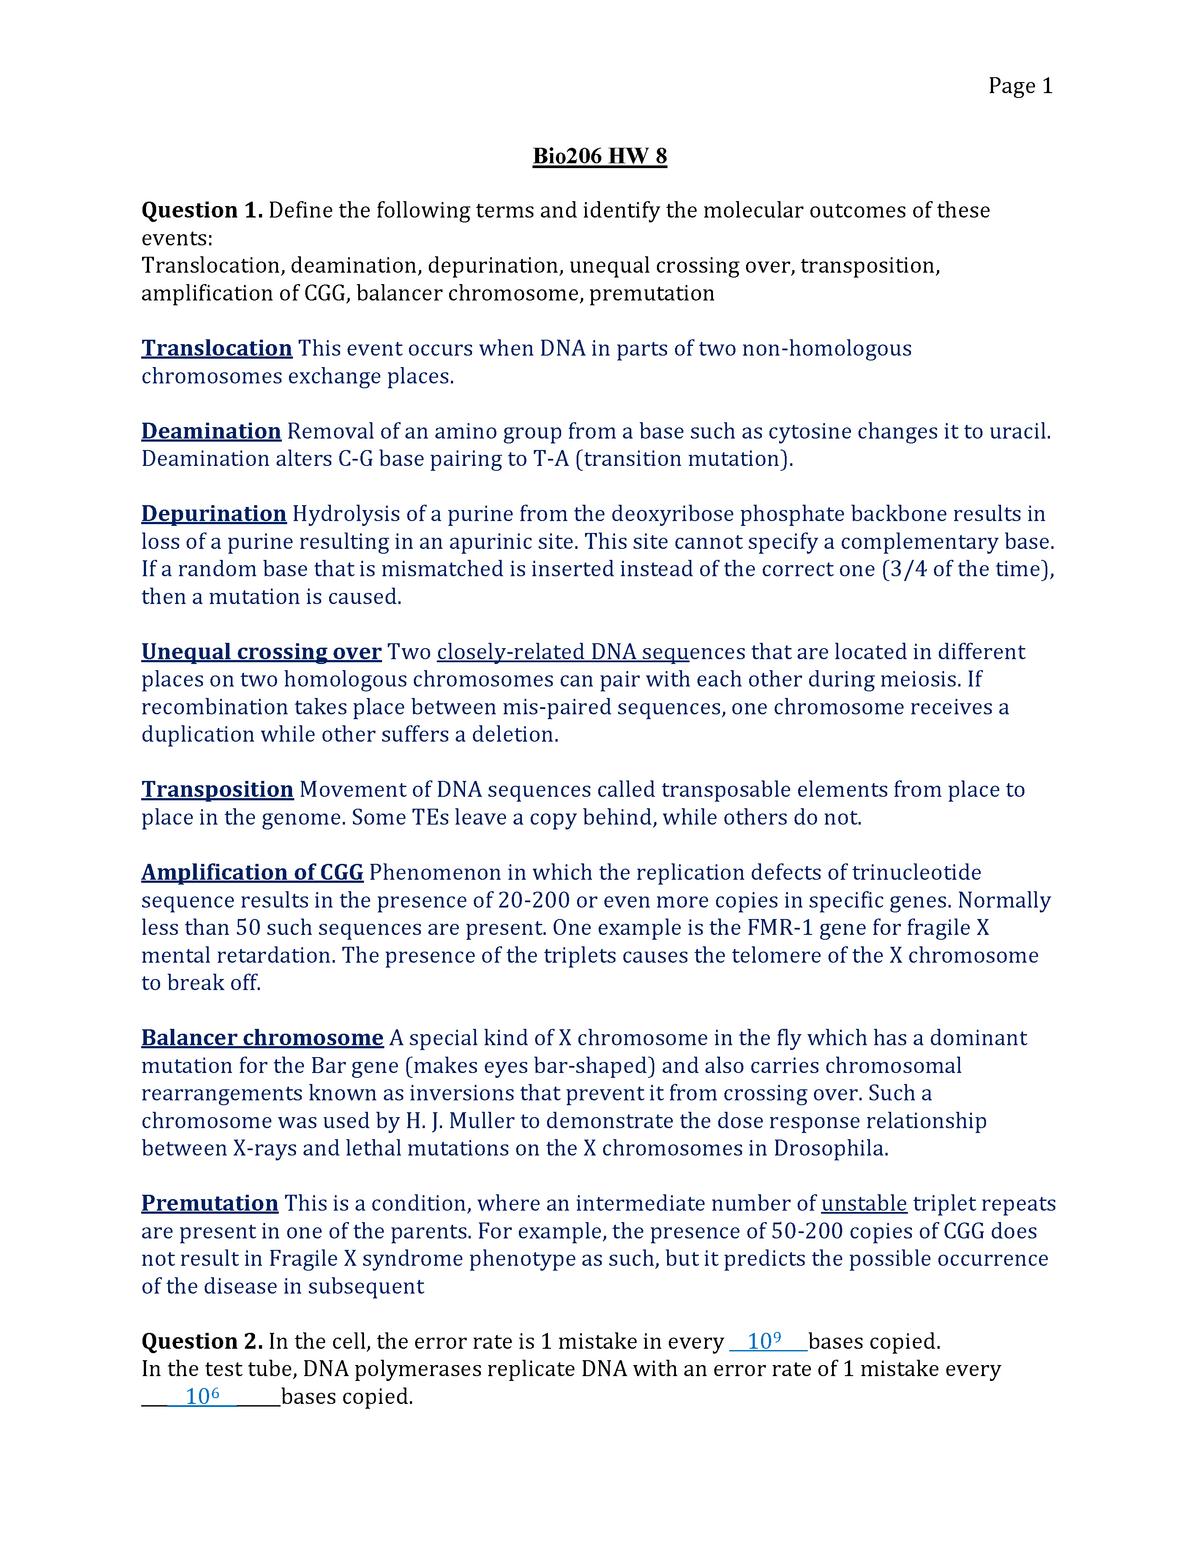 Homeworknumber8KEY - BIO 20600: Introduction To Genetics